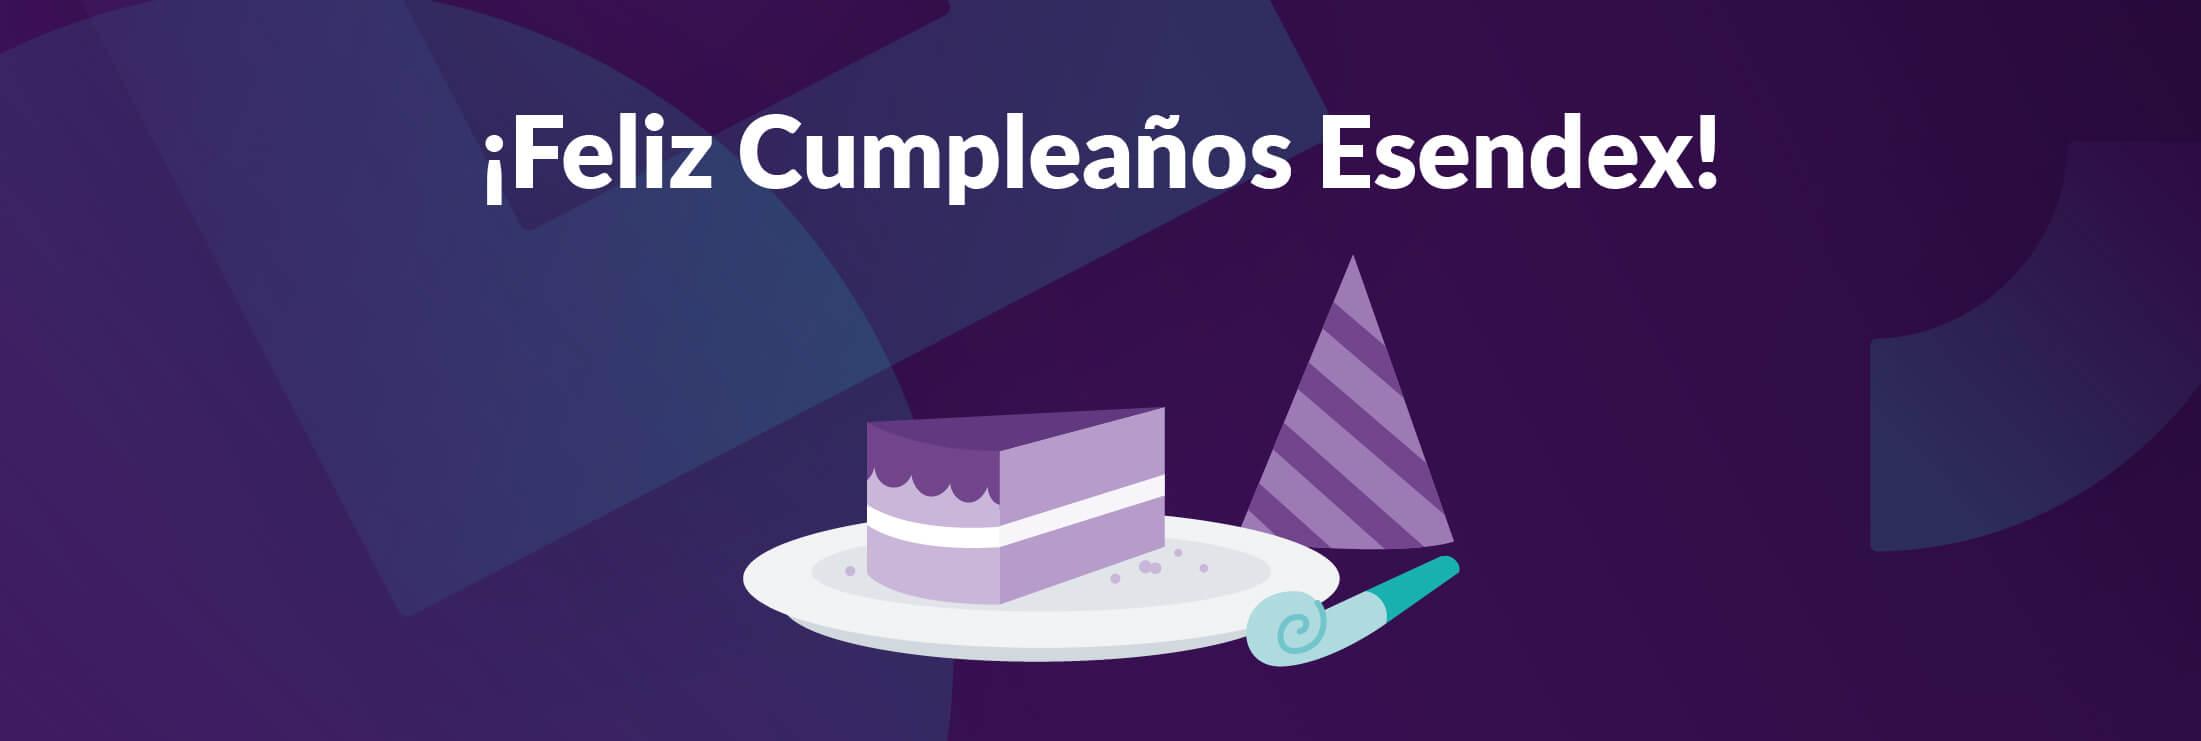 Feliz cumpleaños Esendex